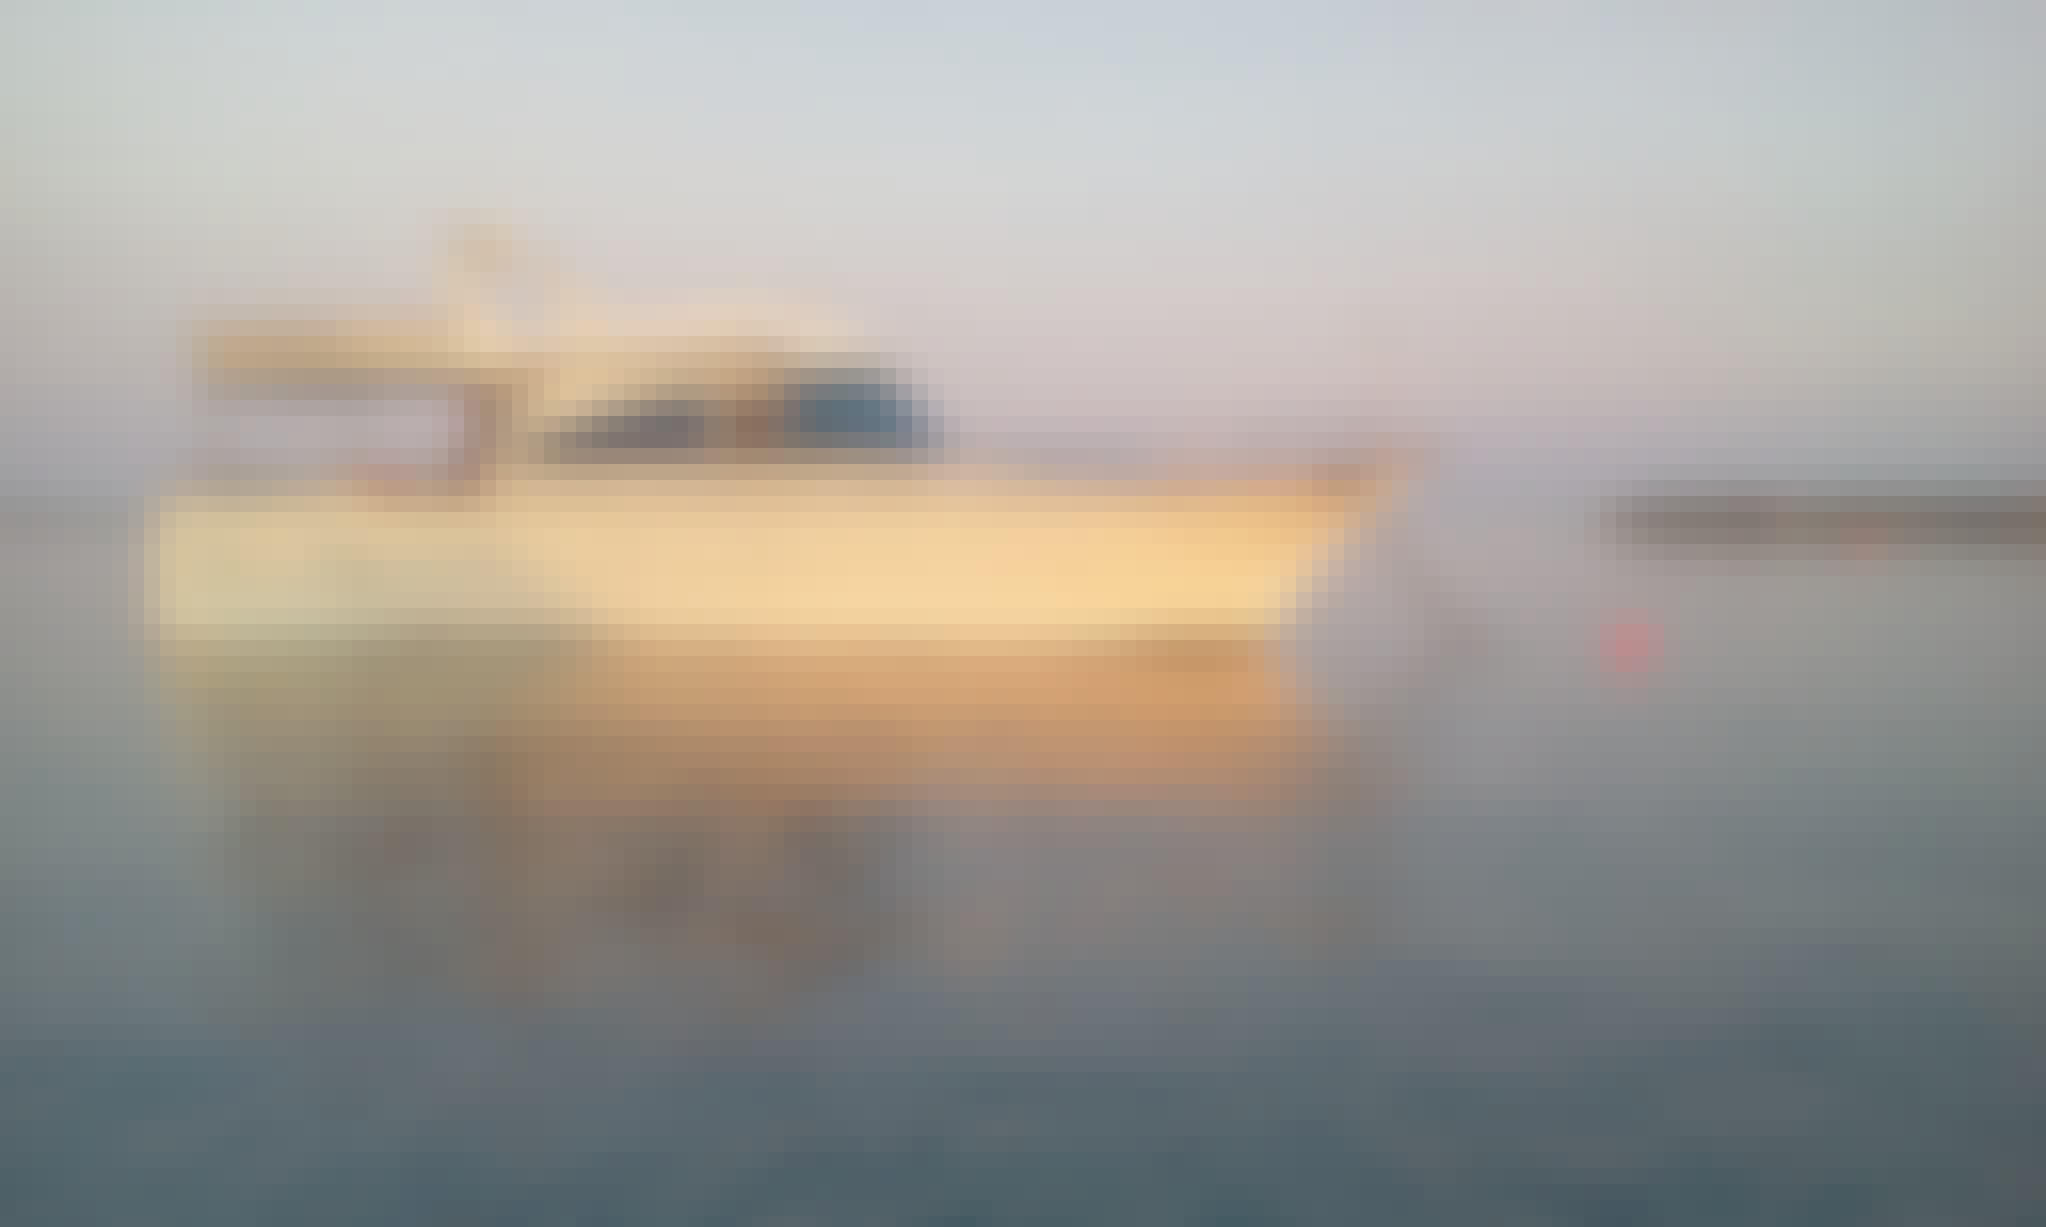 Passenger Boat rental in Limassol, Cyprus